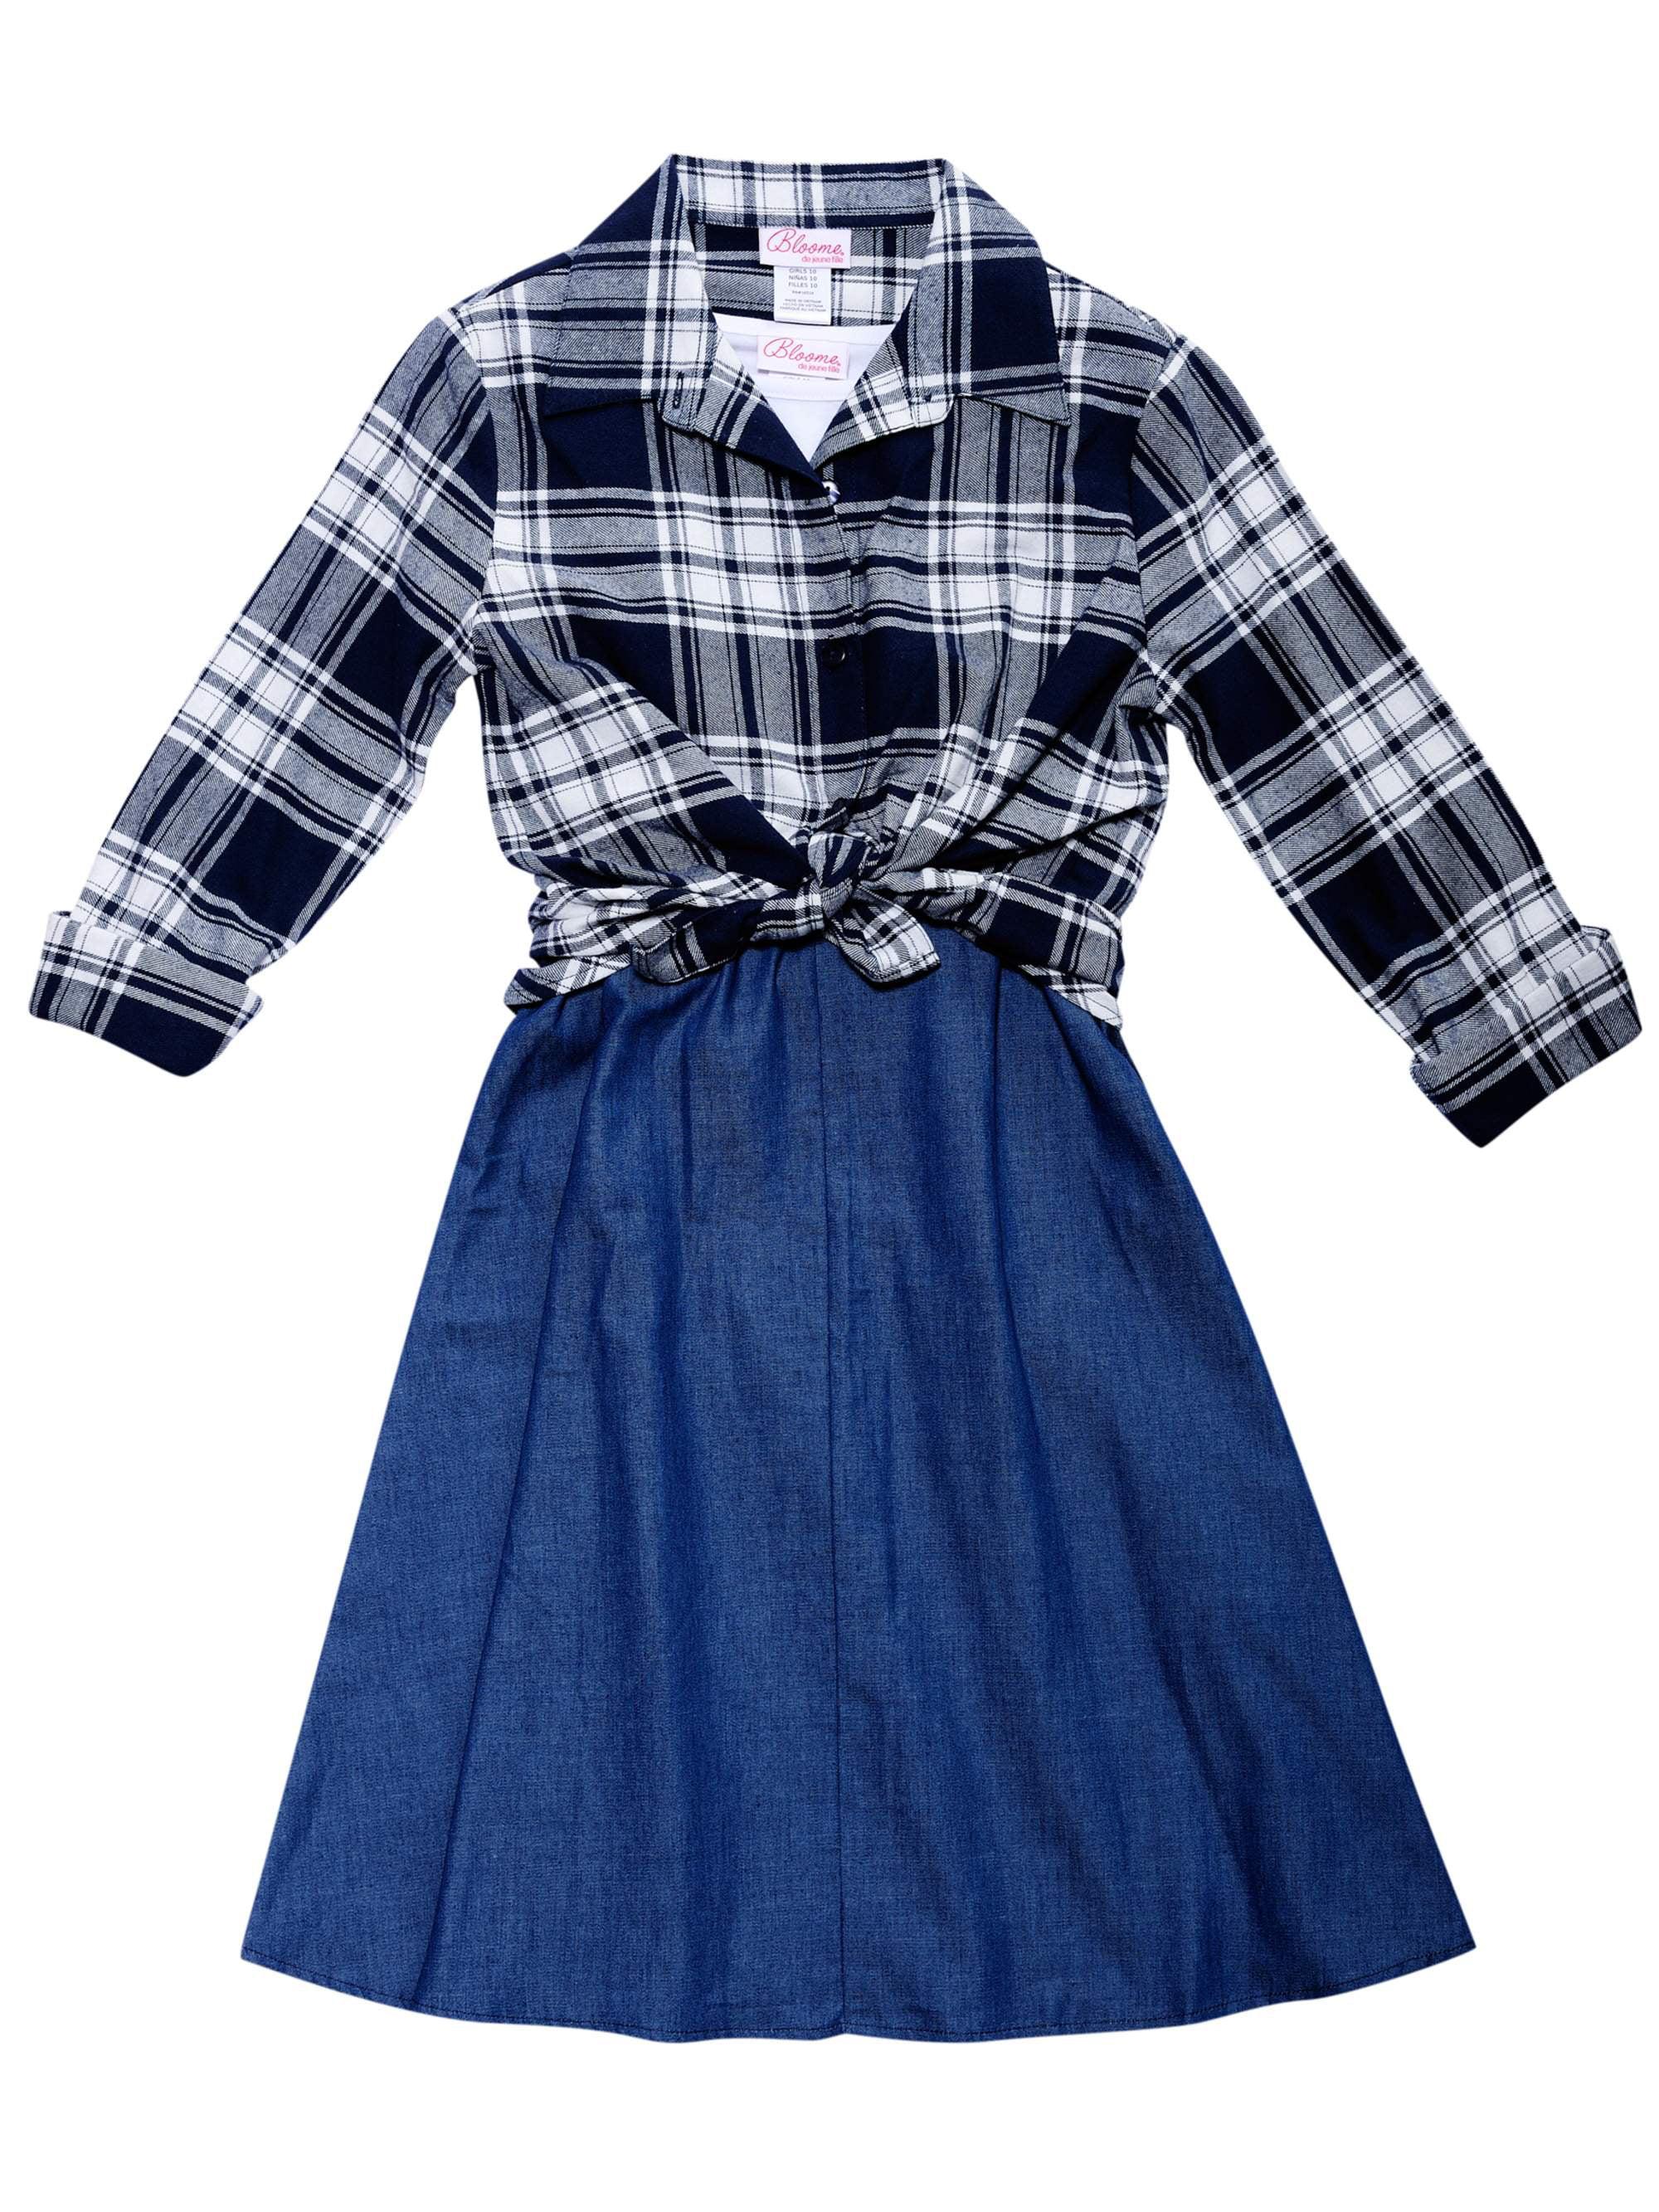 Chambray Slip Dress, Tee & Plaid Shirt, 3-Piece Set (Big Girls)